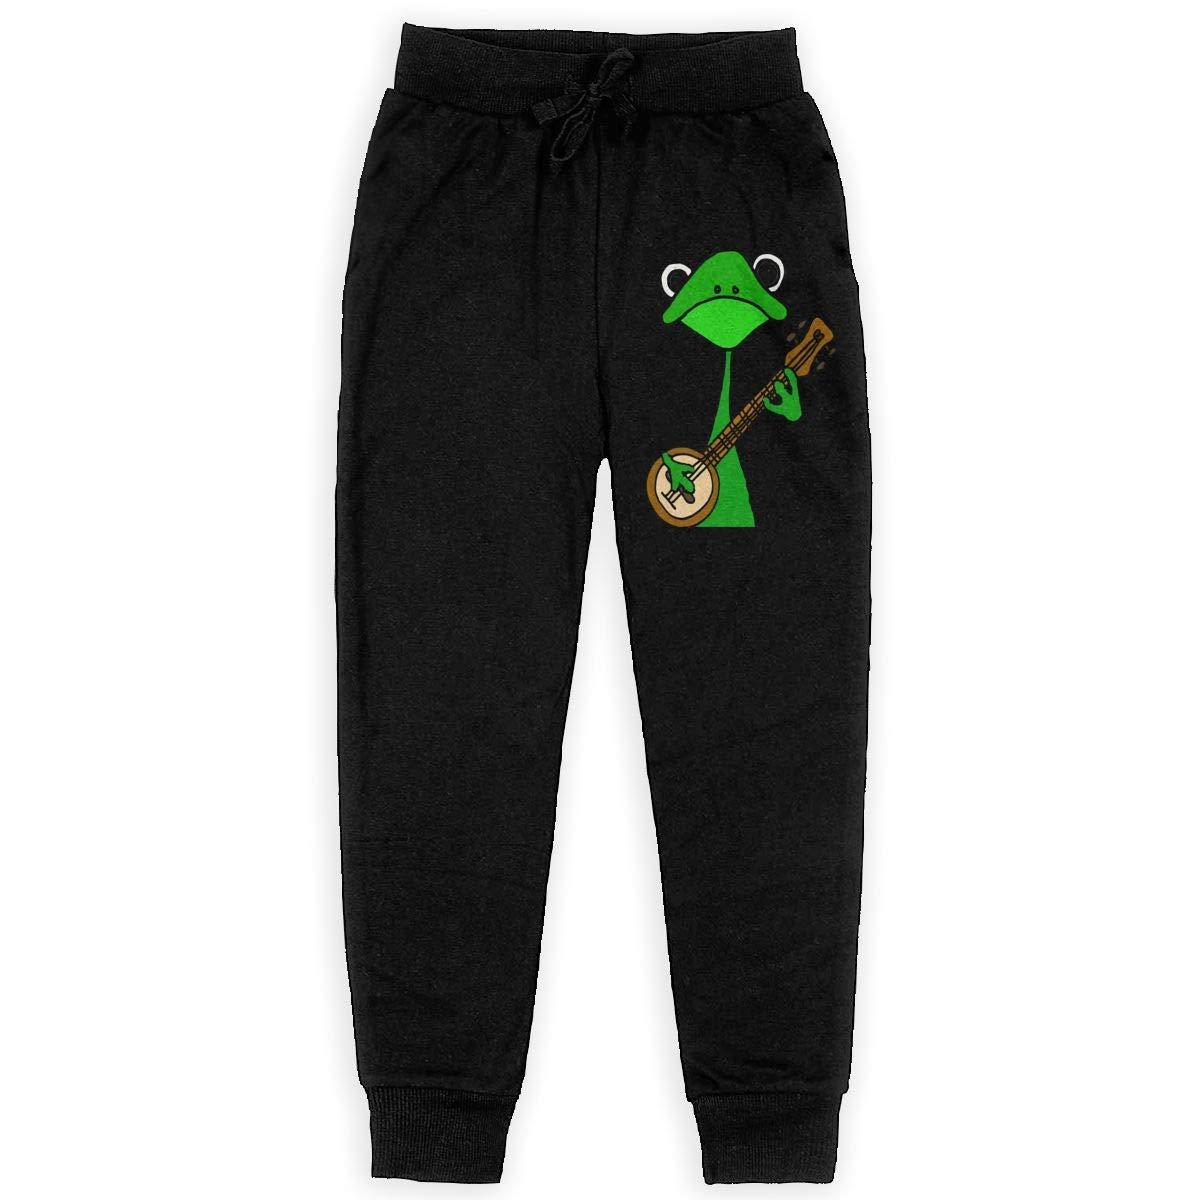 VstiSsxhdai Pantalones de chándal para jóvenes, Athletic Funny ...